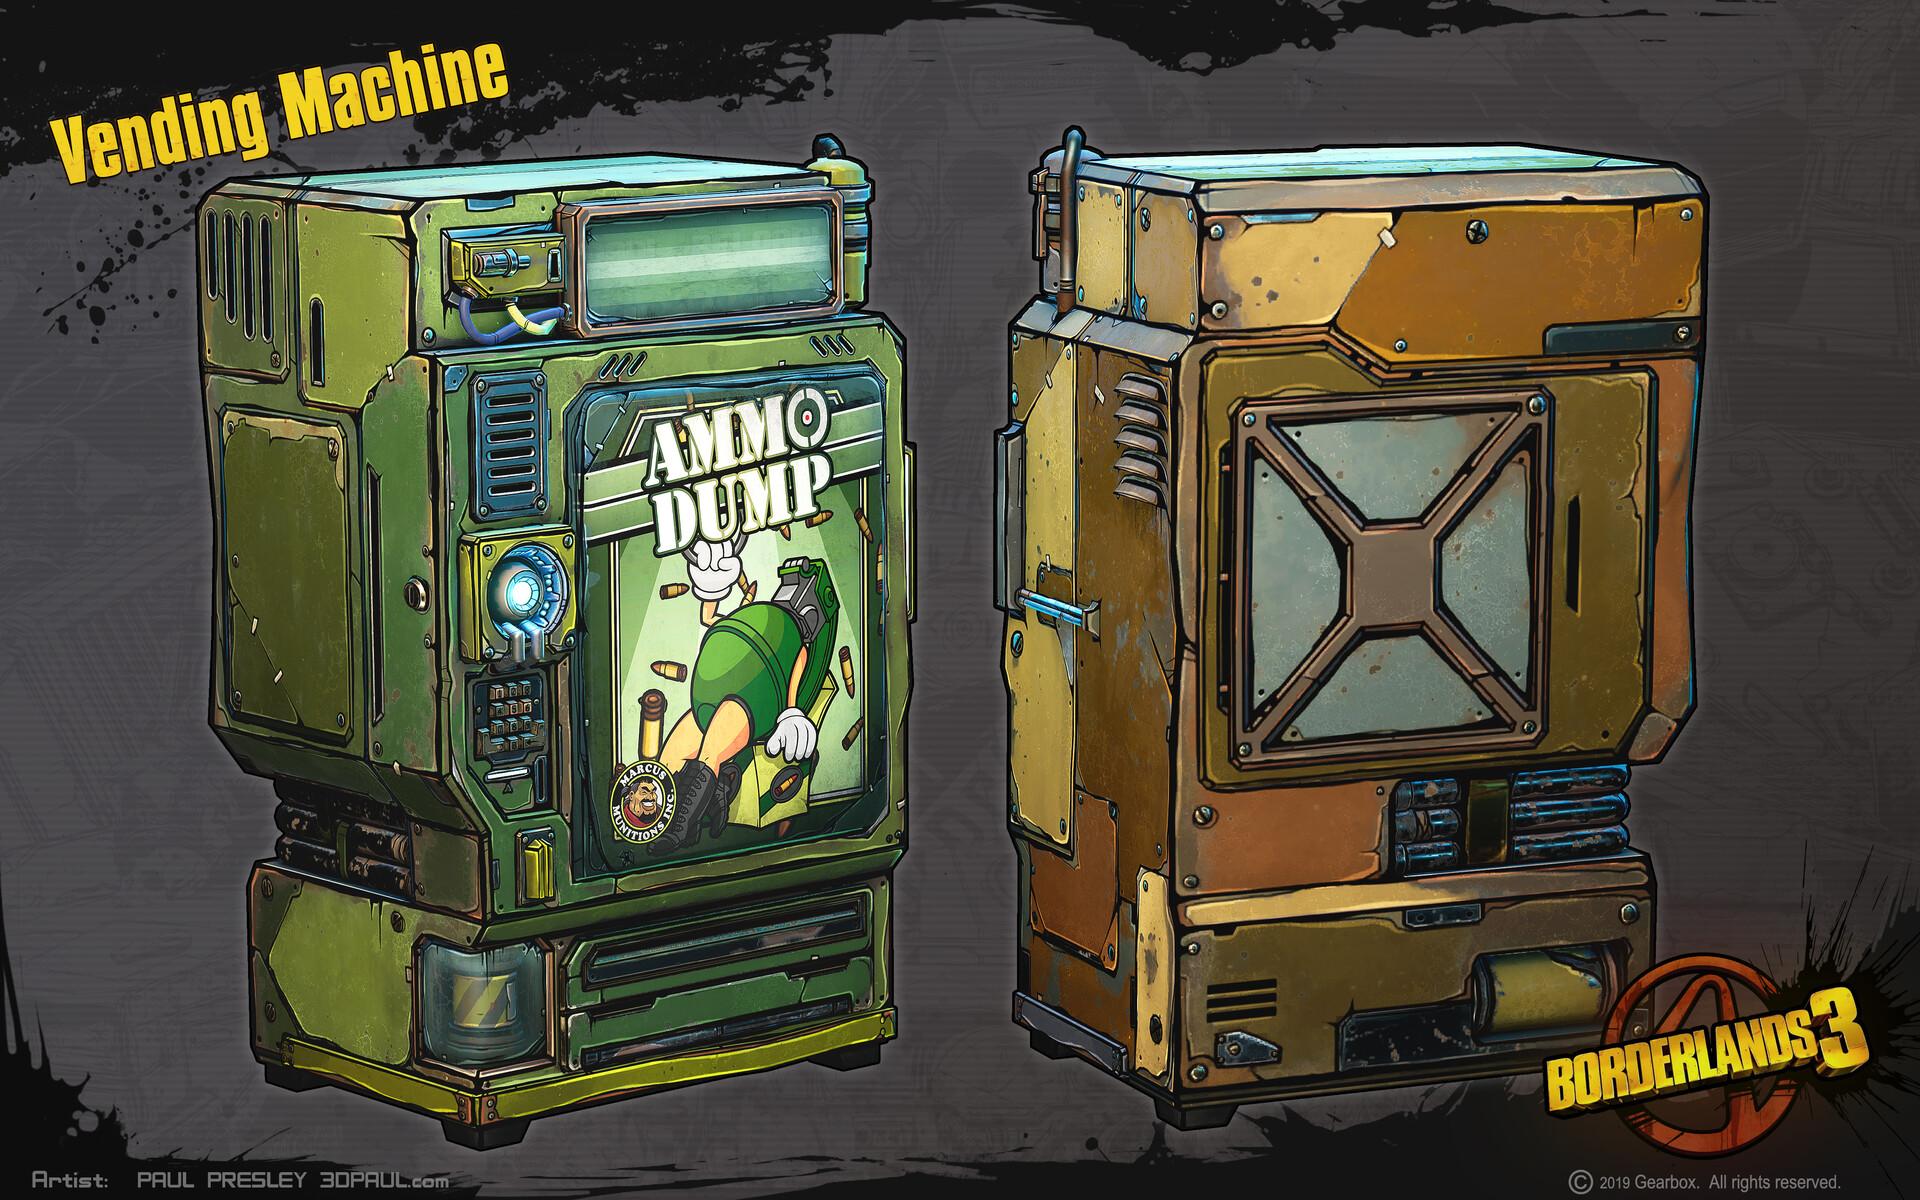 Paul presley paulp vending machine